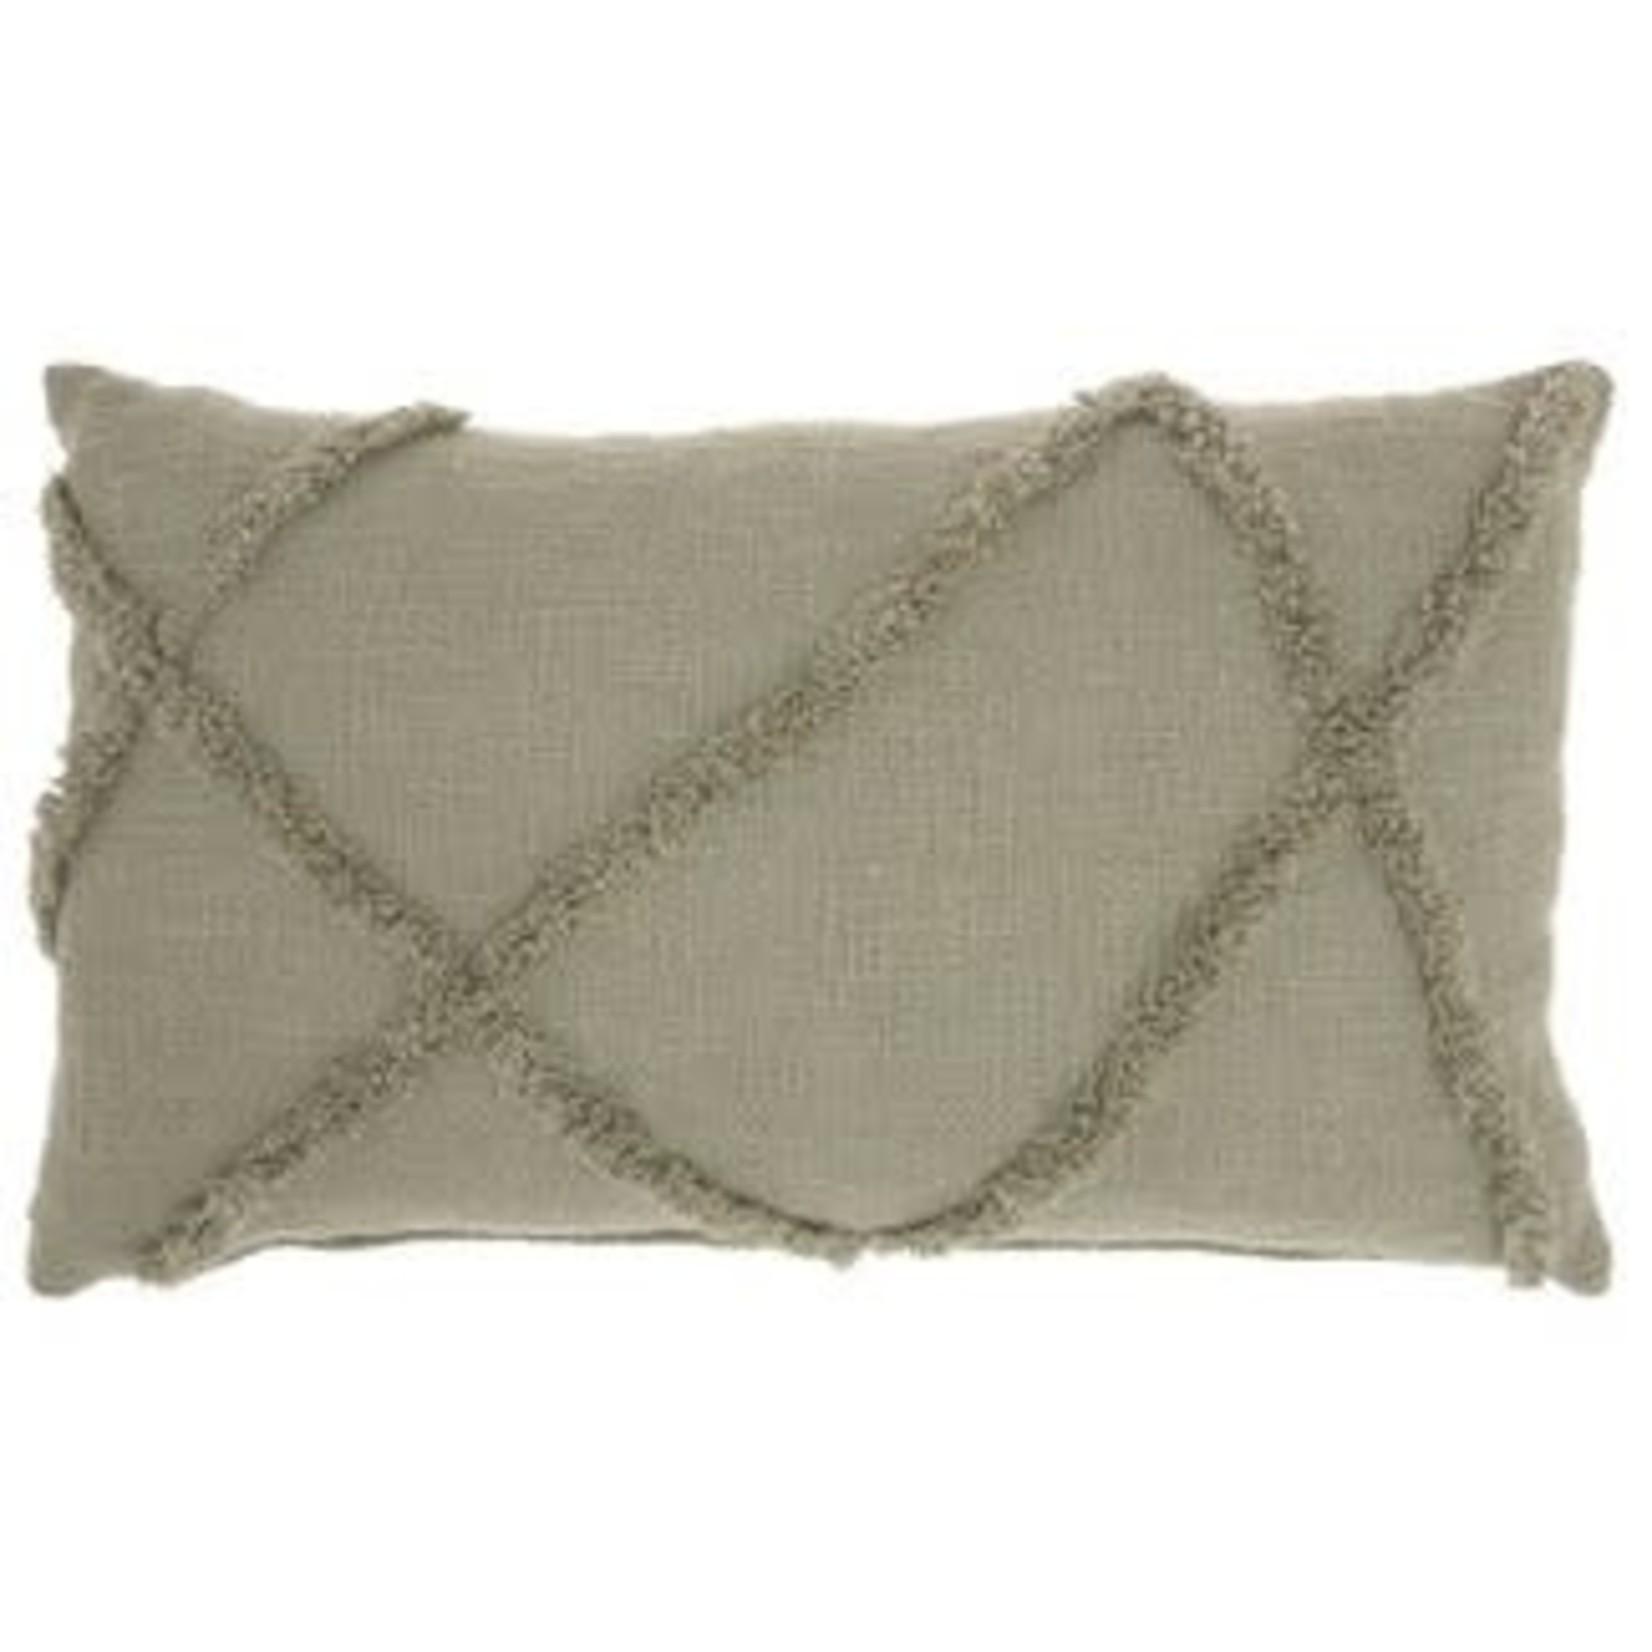 Distressed Diamond Throw Pillow - Mina Victory